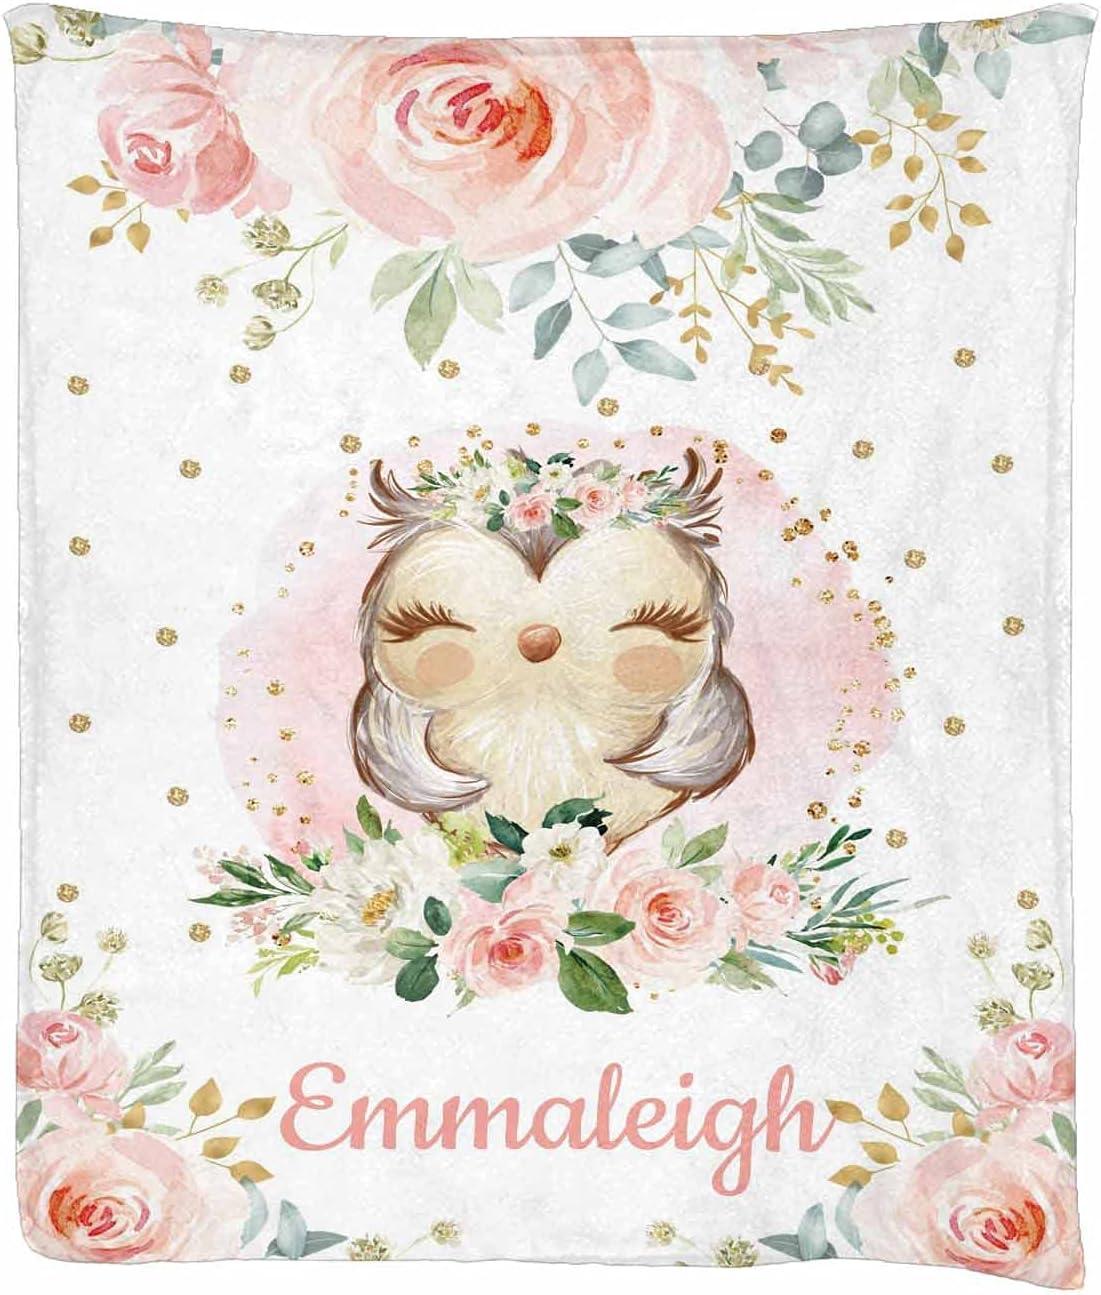 MyPupSocks Custom price Personalized Name Fleece Blanket Owl Chicago Mall Nursey Pl